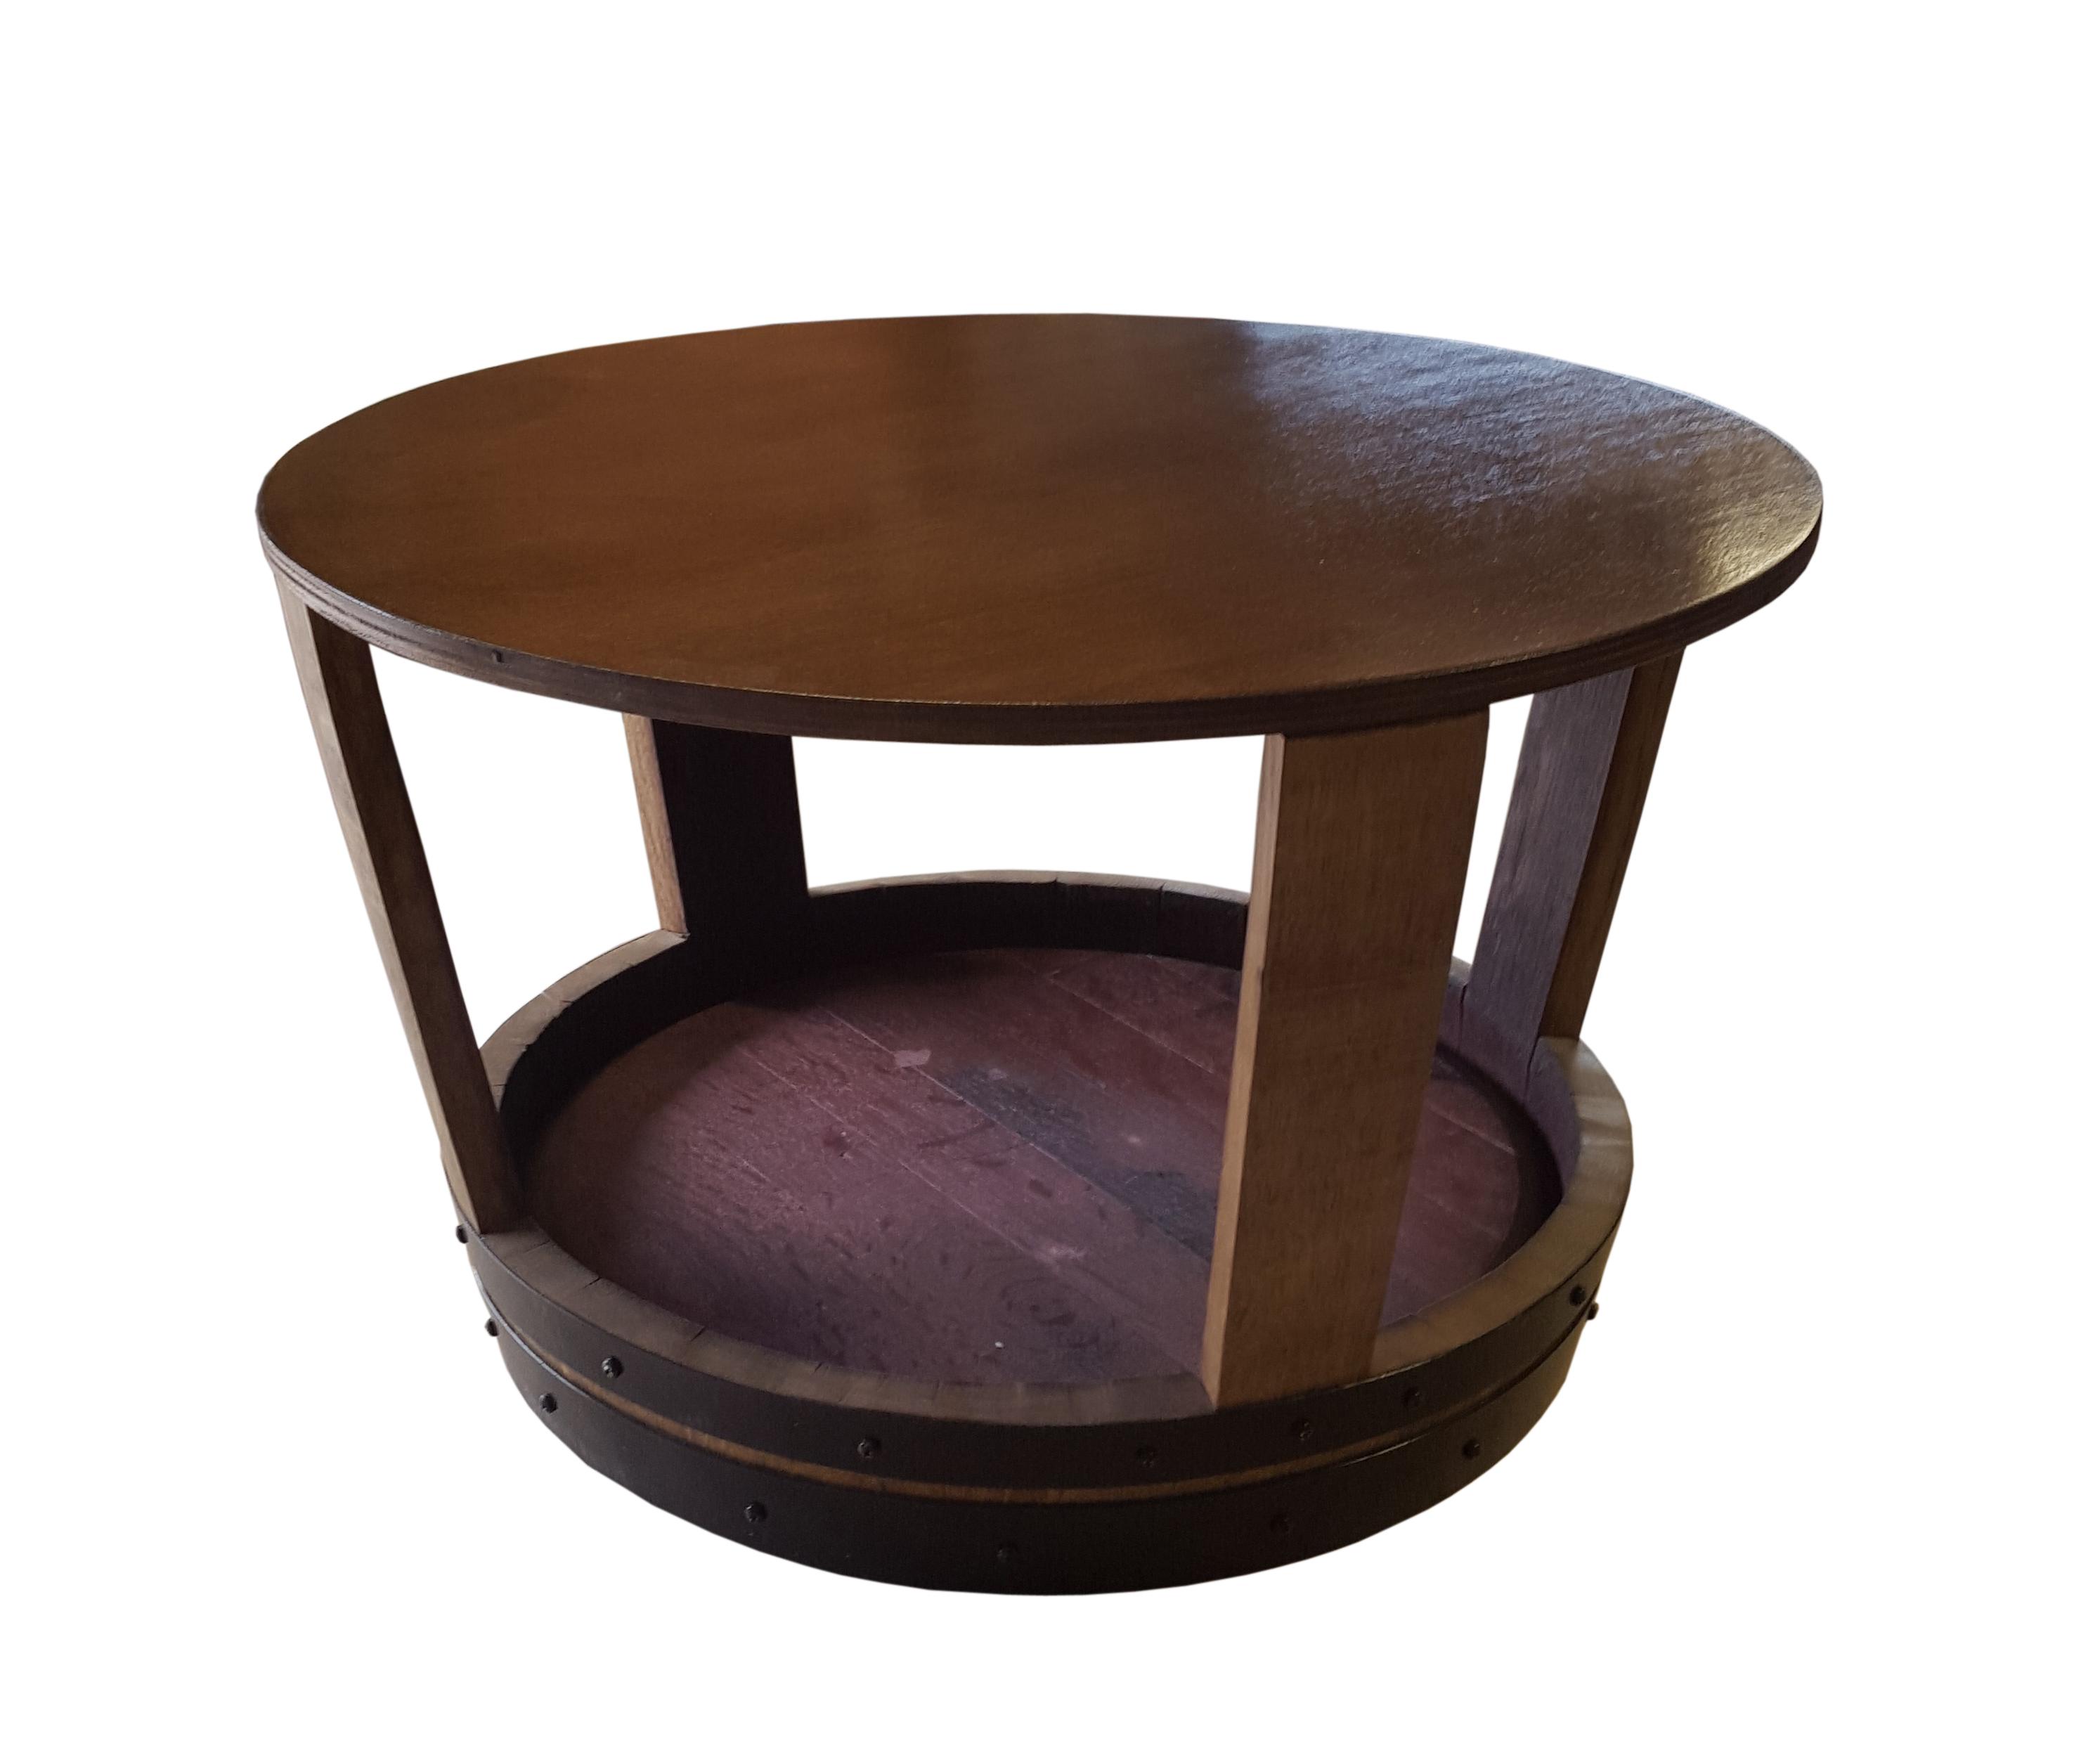 Table Basse Chene Massif Barrique Creation